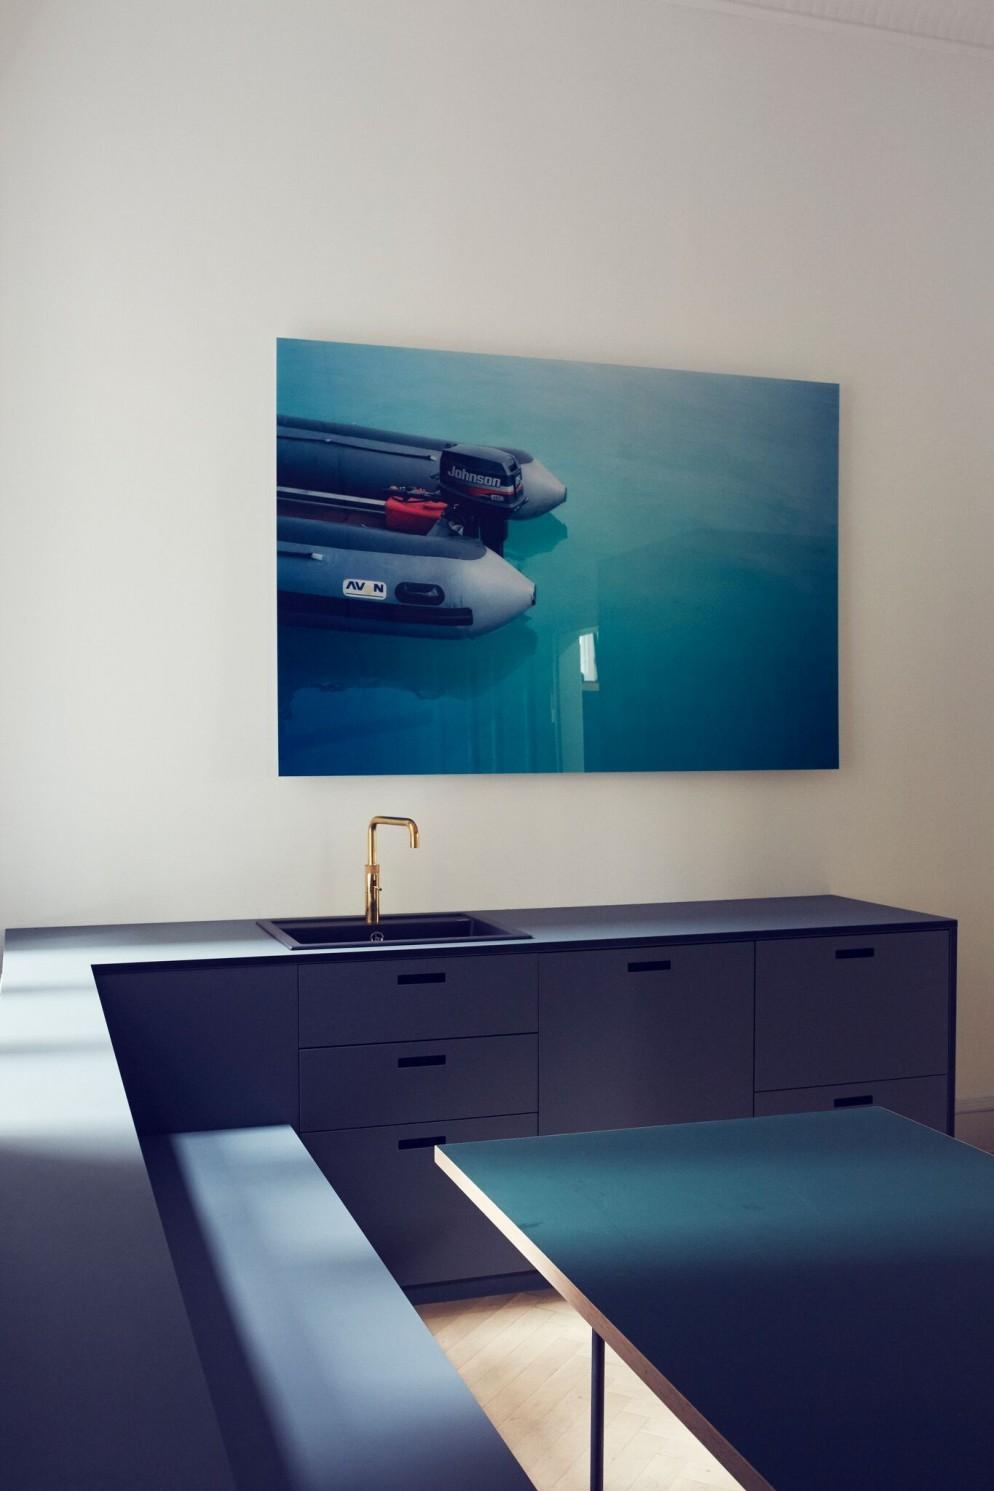 arredare-airbnb-imm1